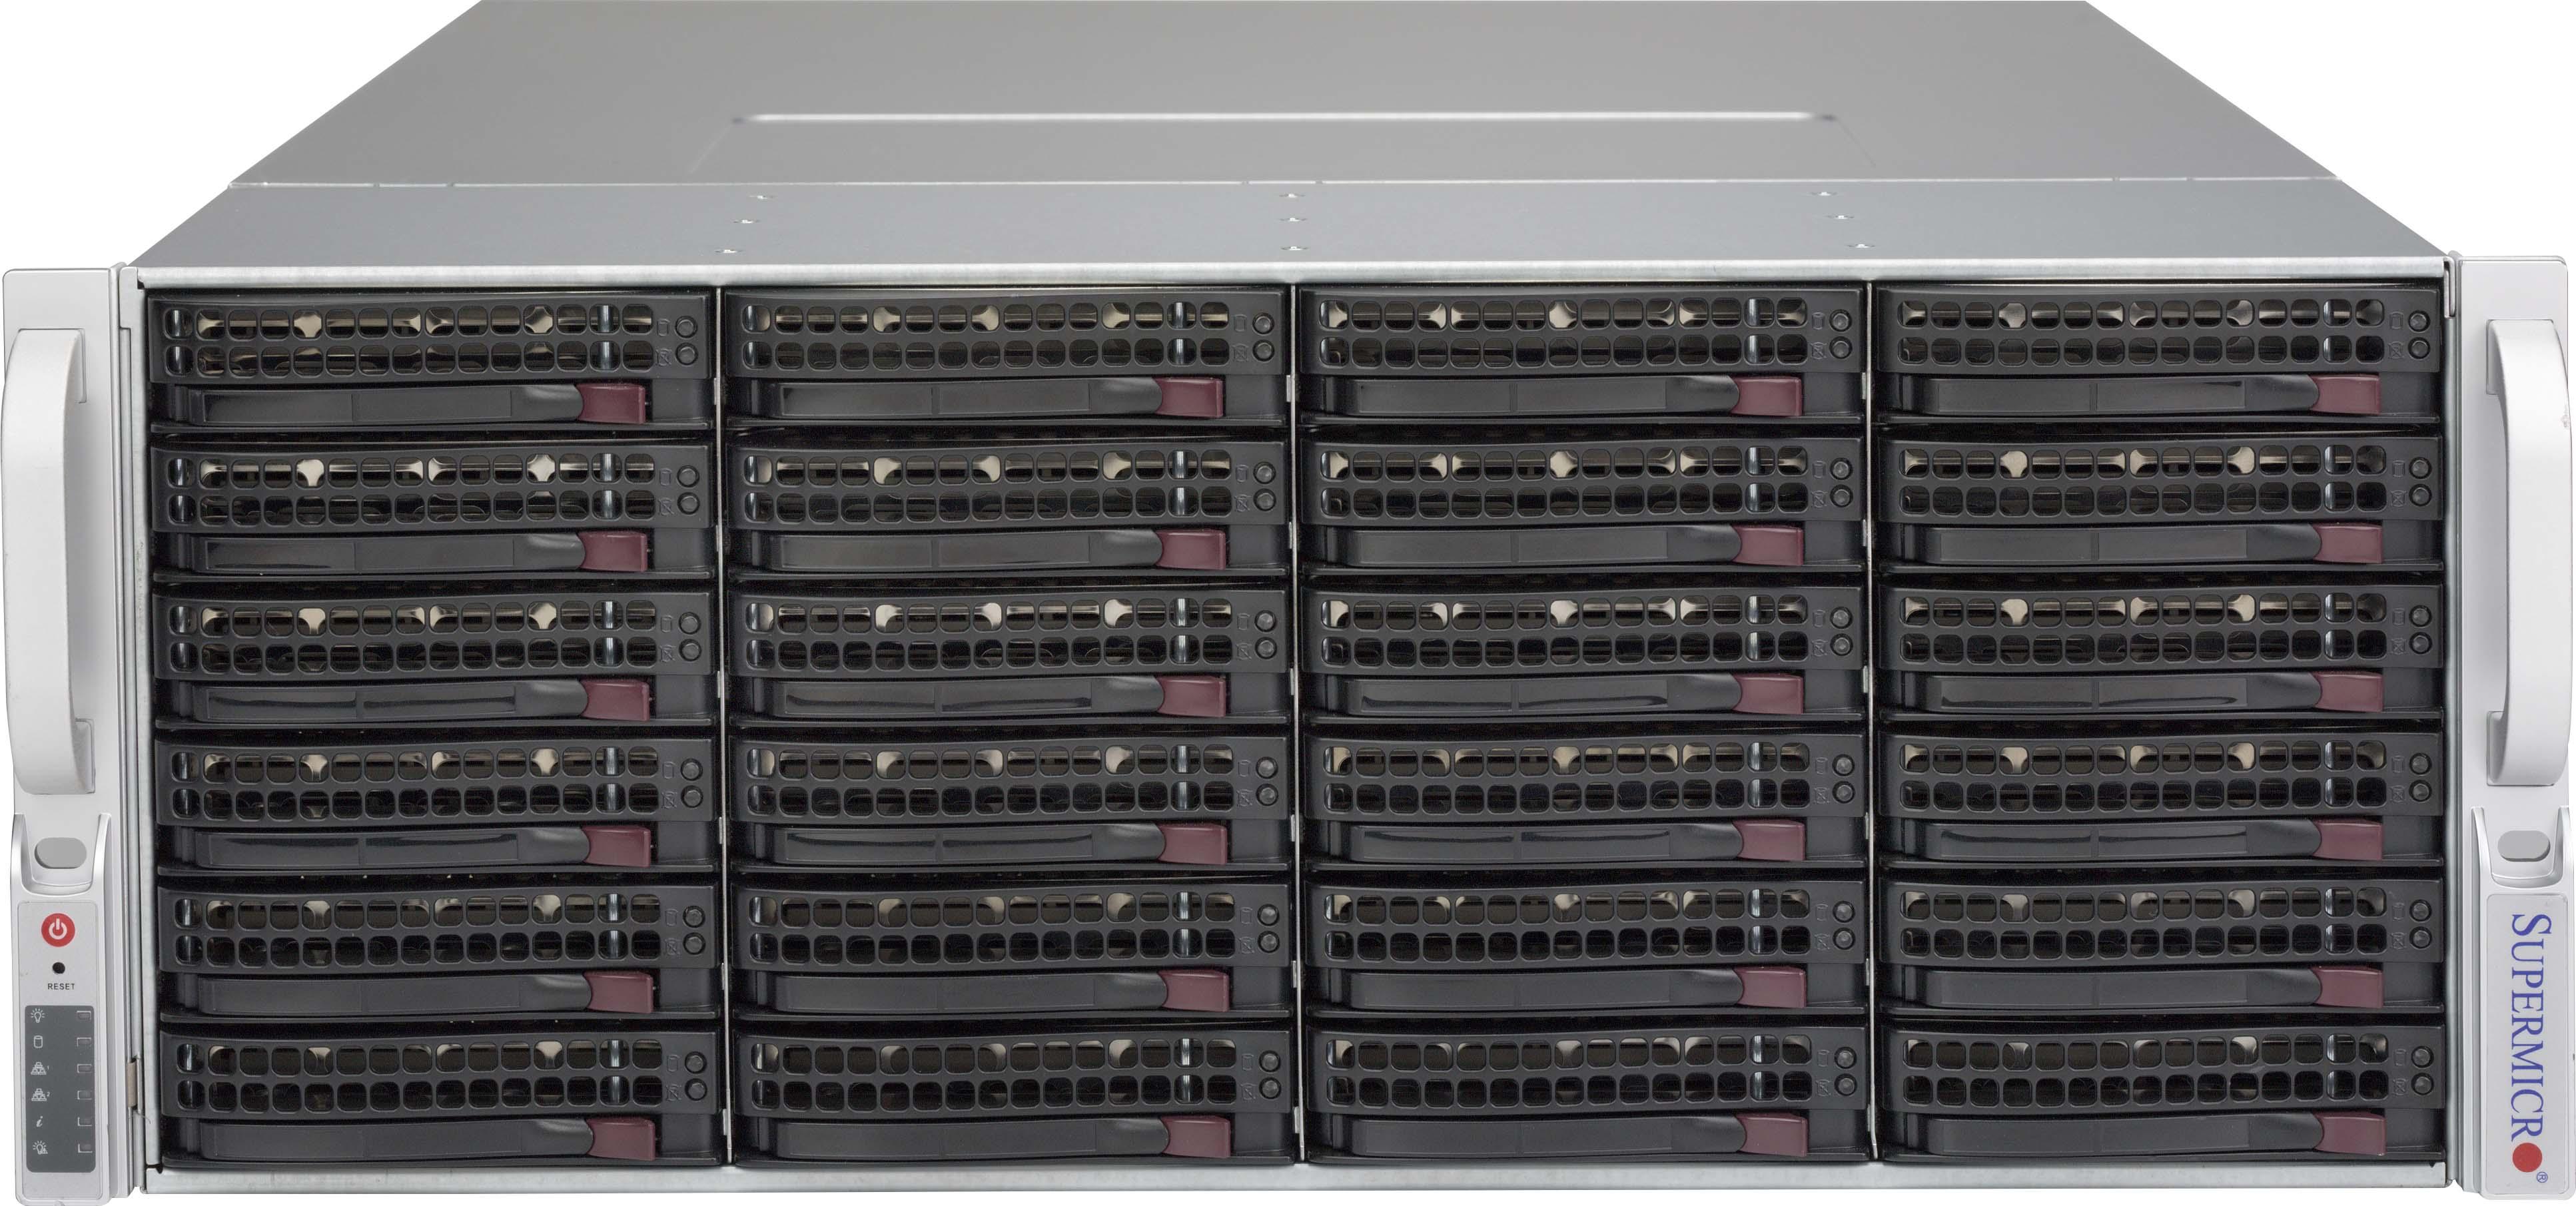 ¿Tu empresa todavía usa servidores físicos? ¿Por qué?